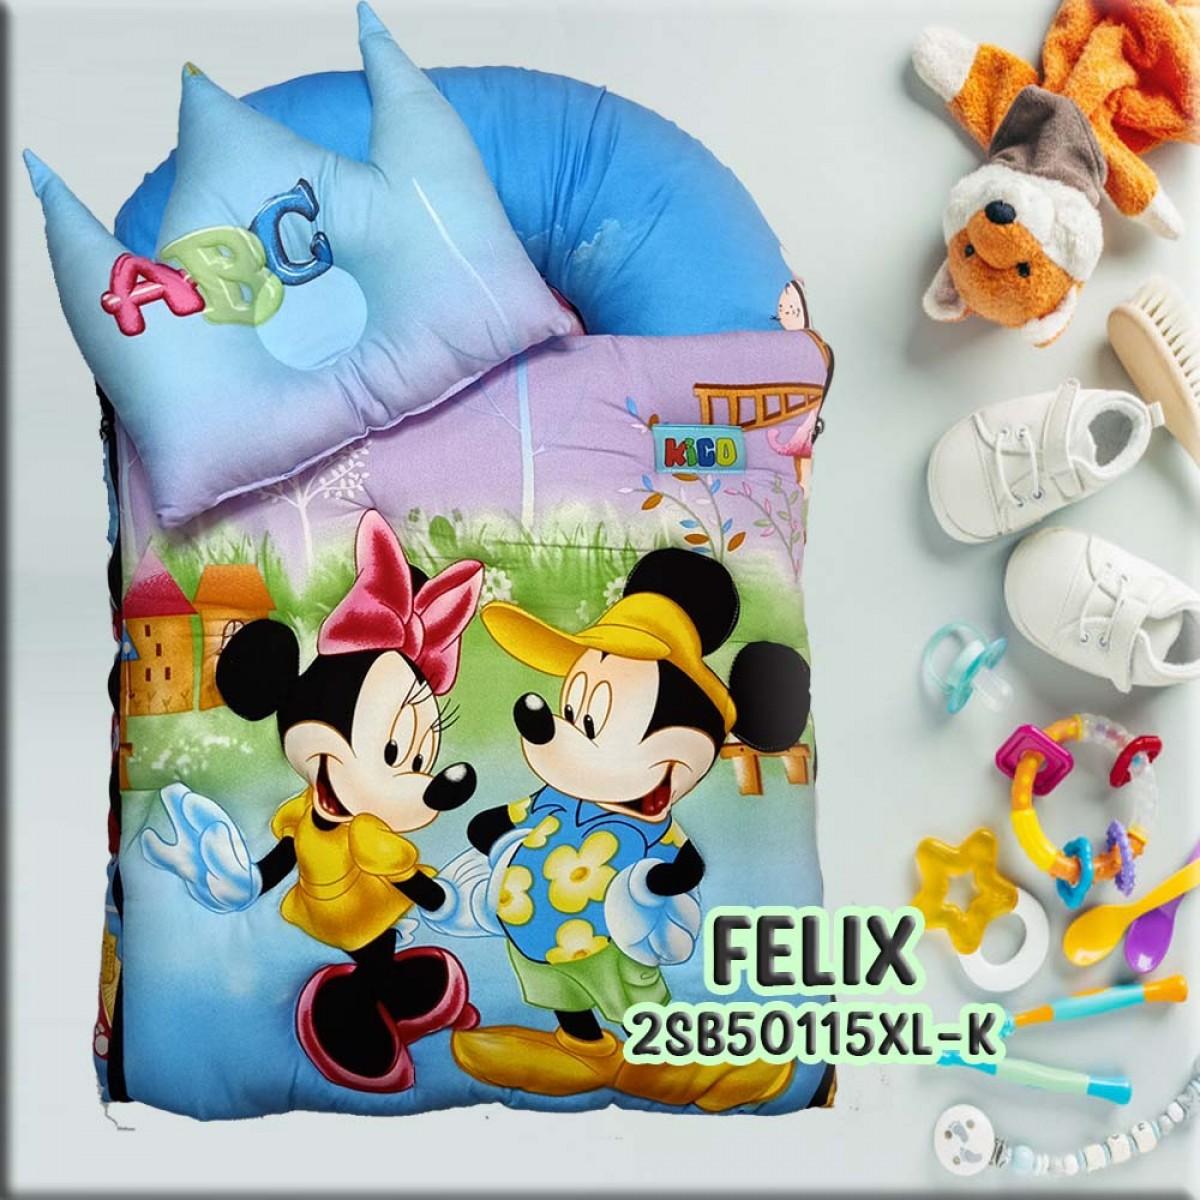 Felix - Kico Baby Center